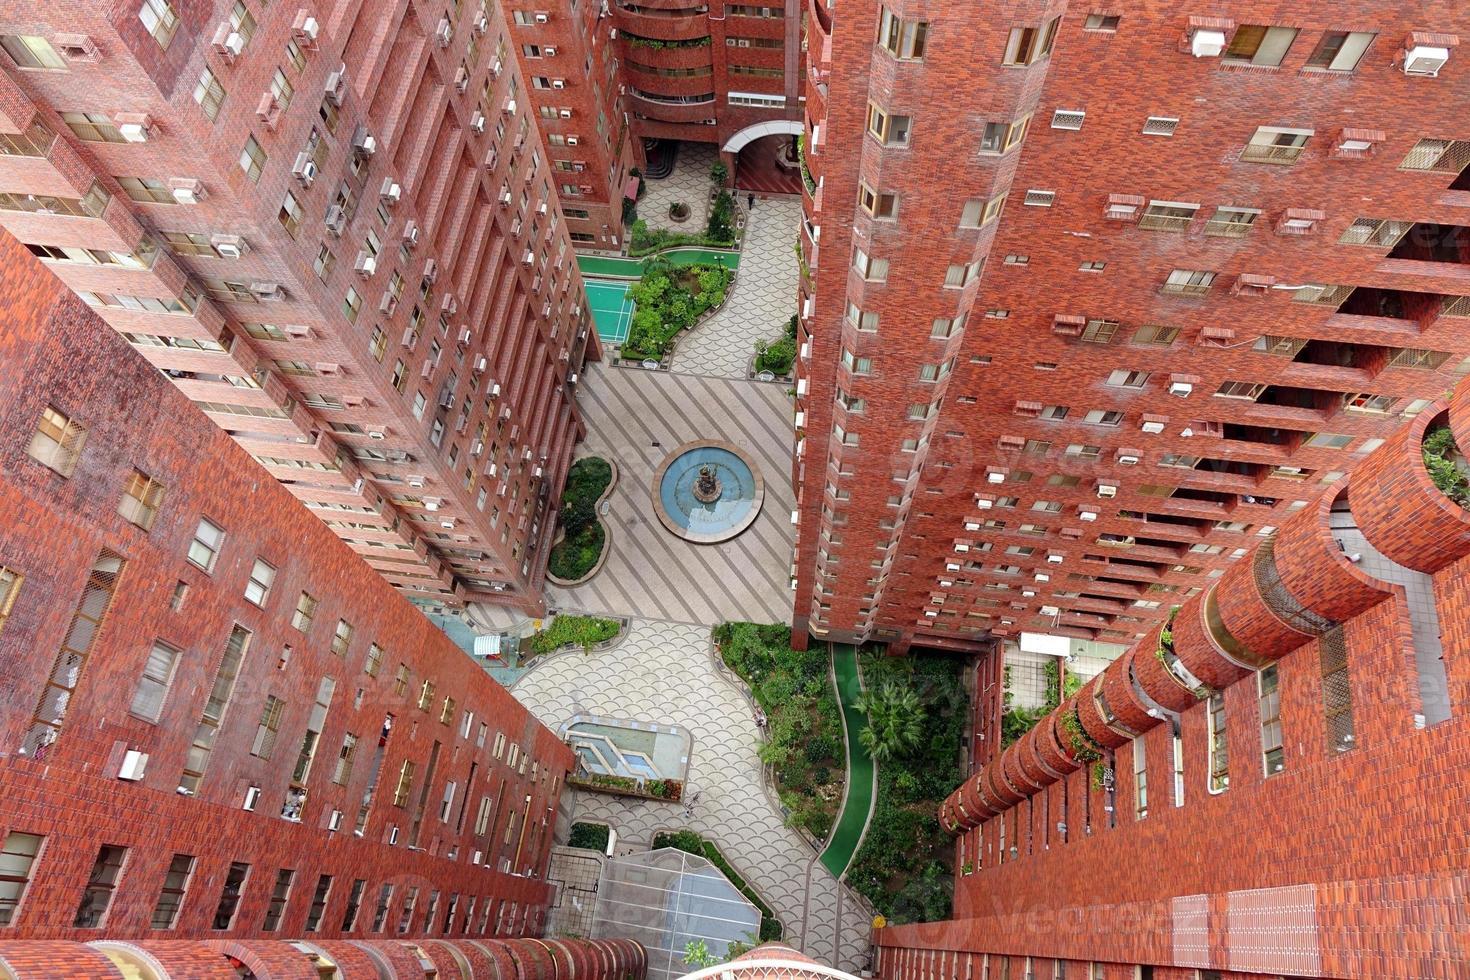 hoogbouw residentiële appartementen foto